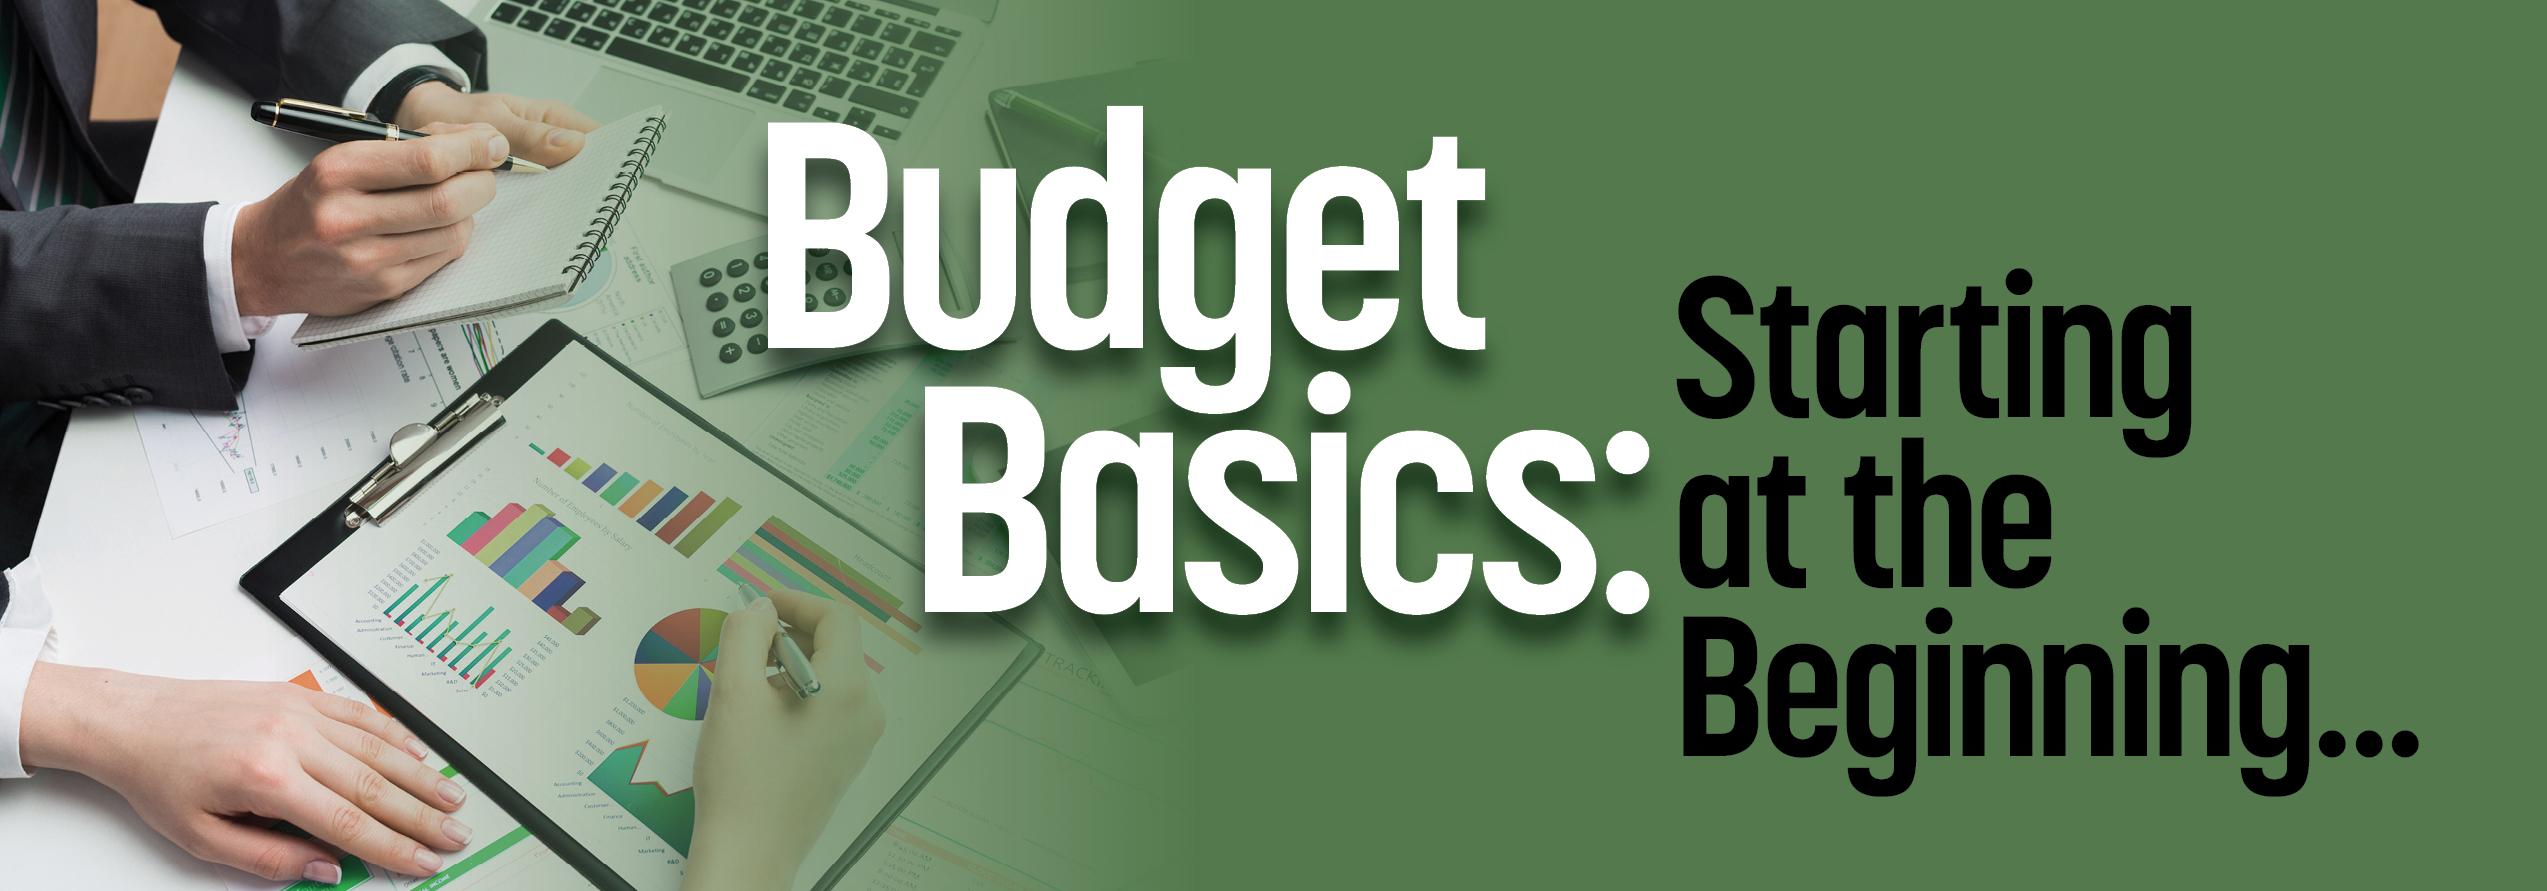 Budgeting Basics: Starting at the Beginning